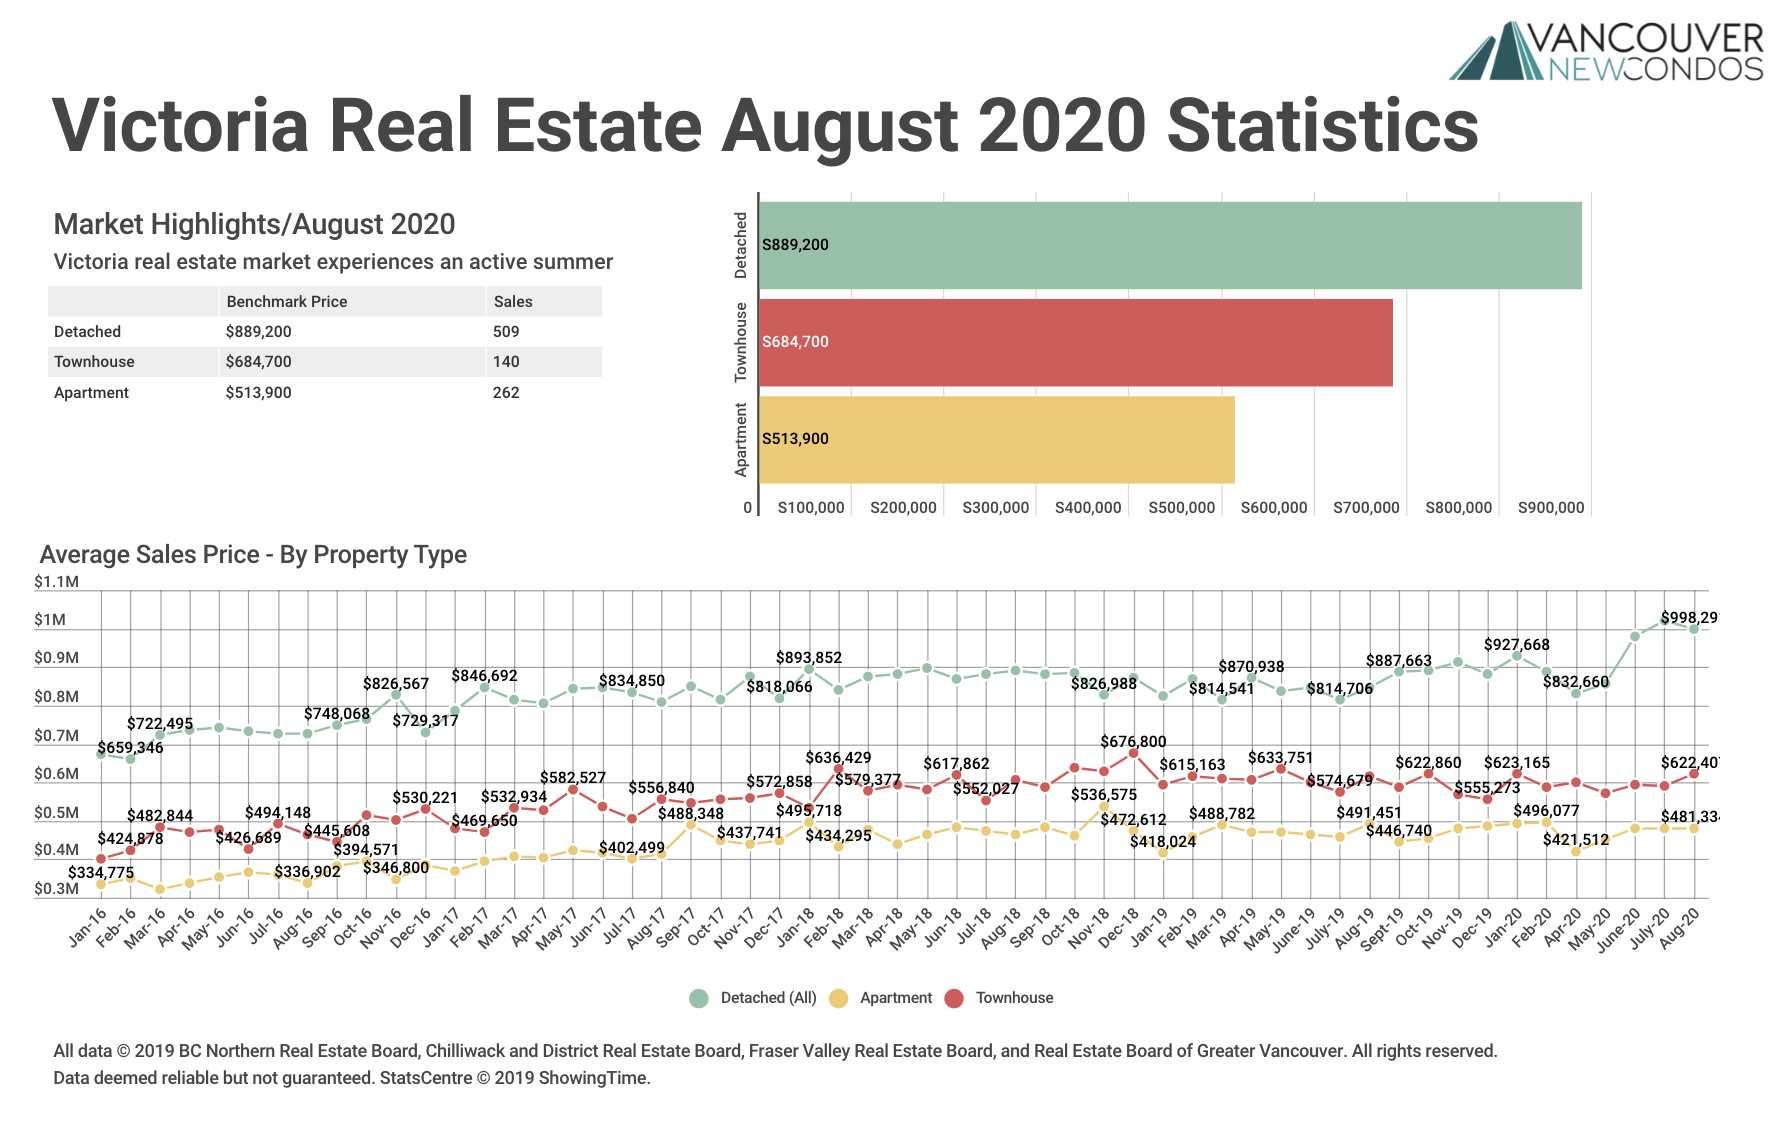 VREB Aug 2020 Stats Graph